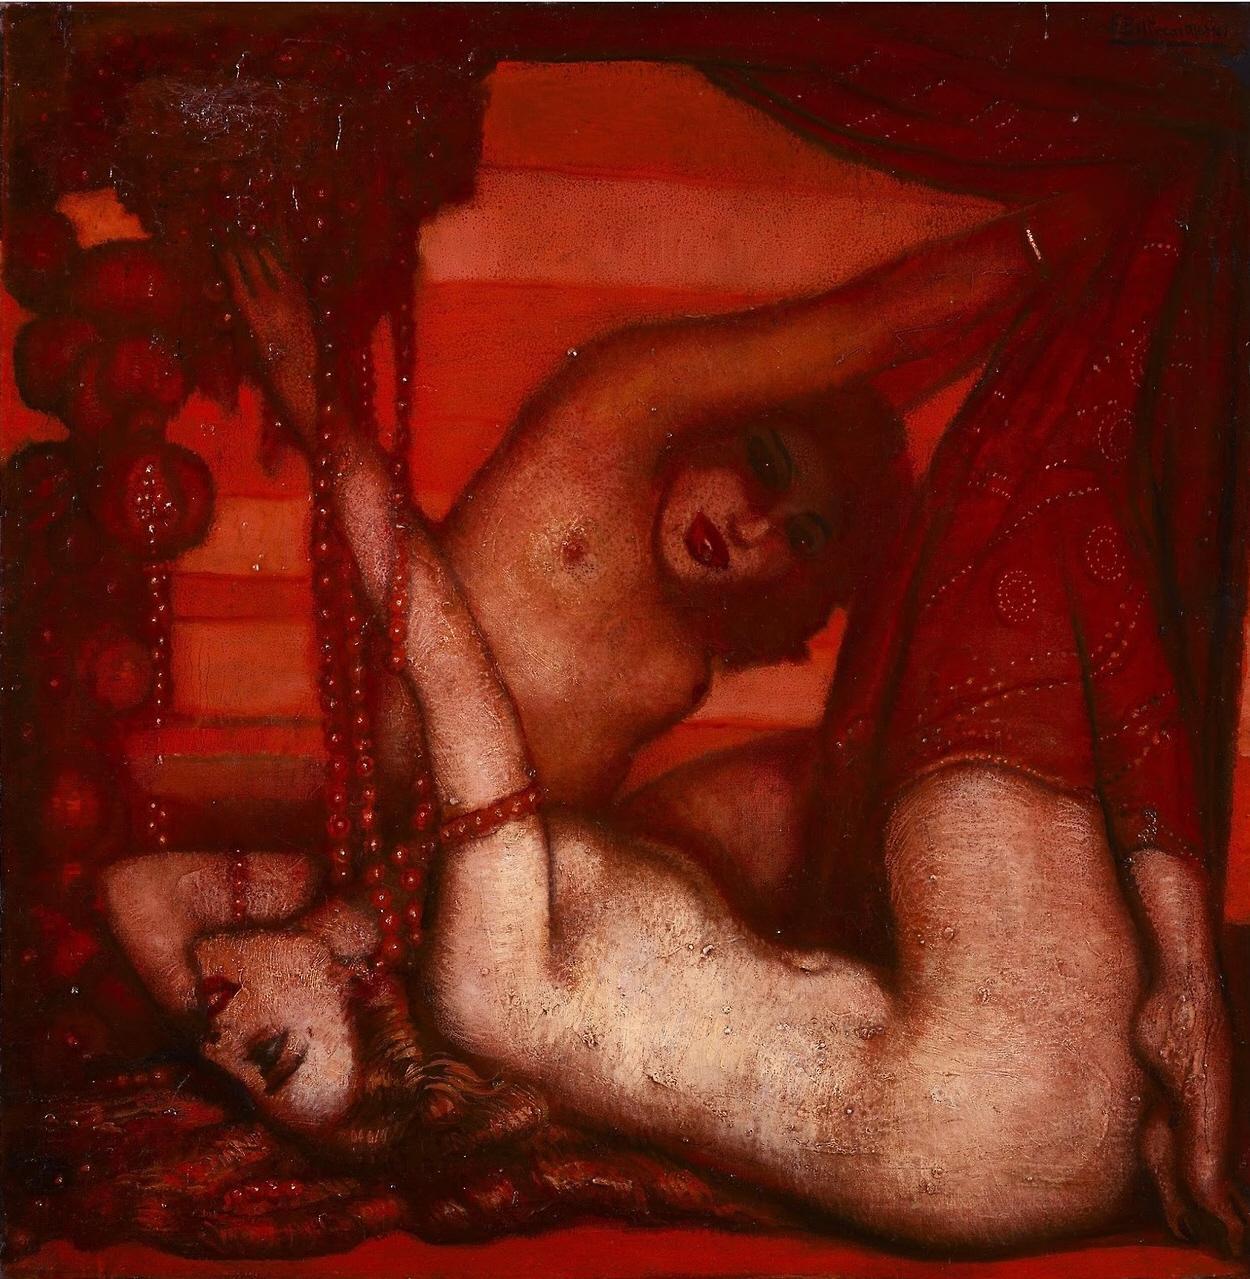 Federico Armando Beltrán Masses (1885–1949), Le Rubis, 1929